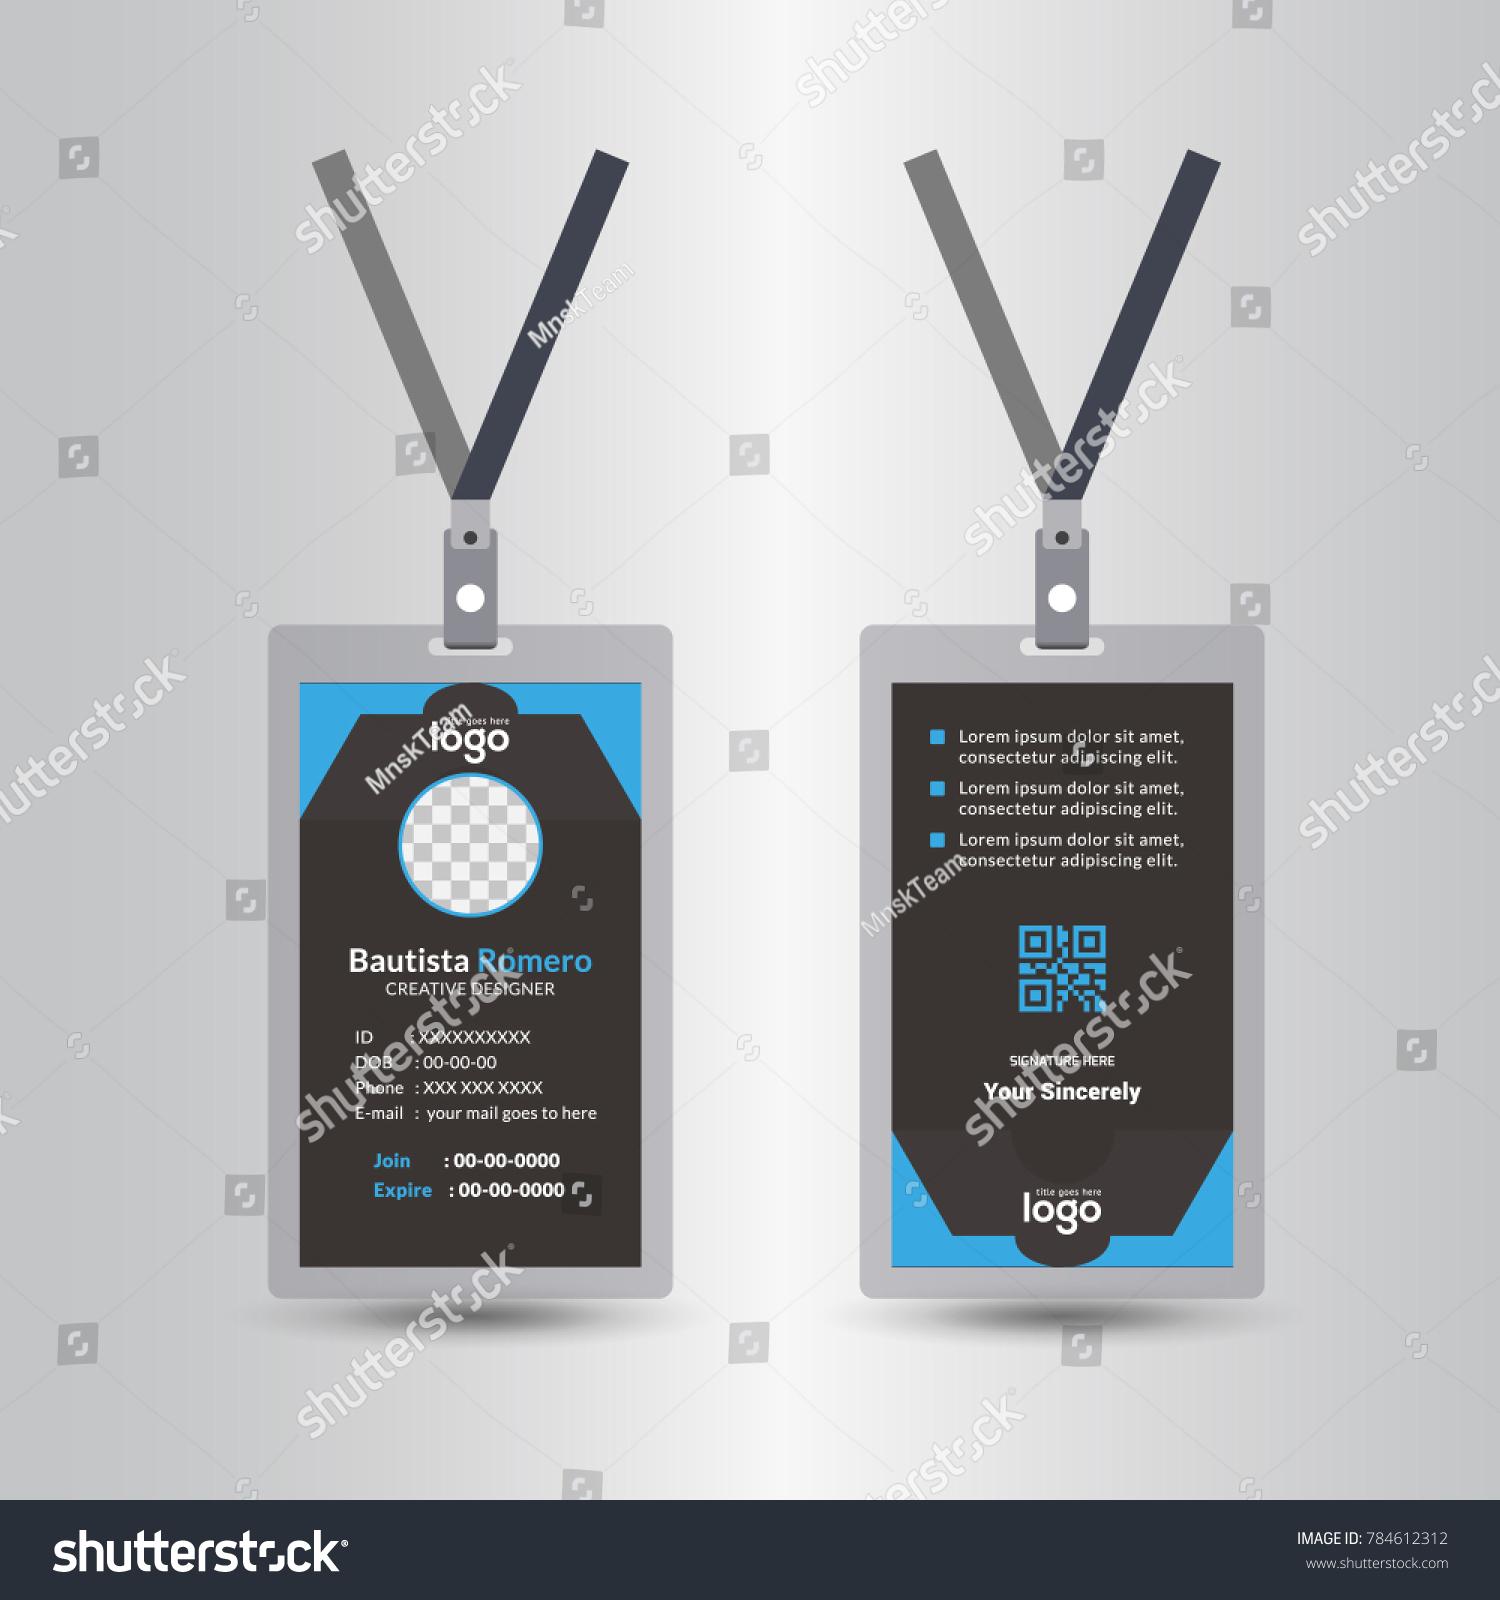 Template Staff Employee Identification Card Vector Stock Vector ...